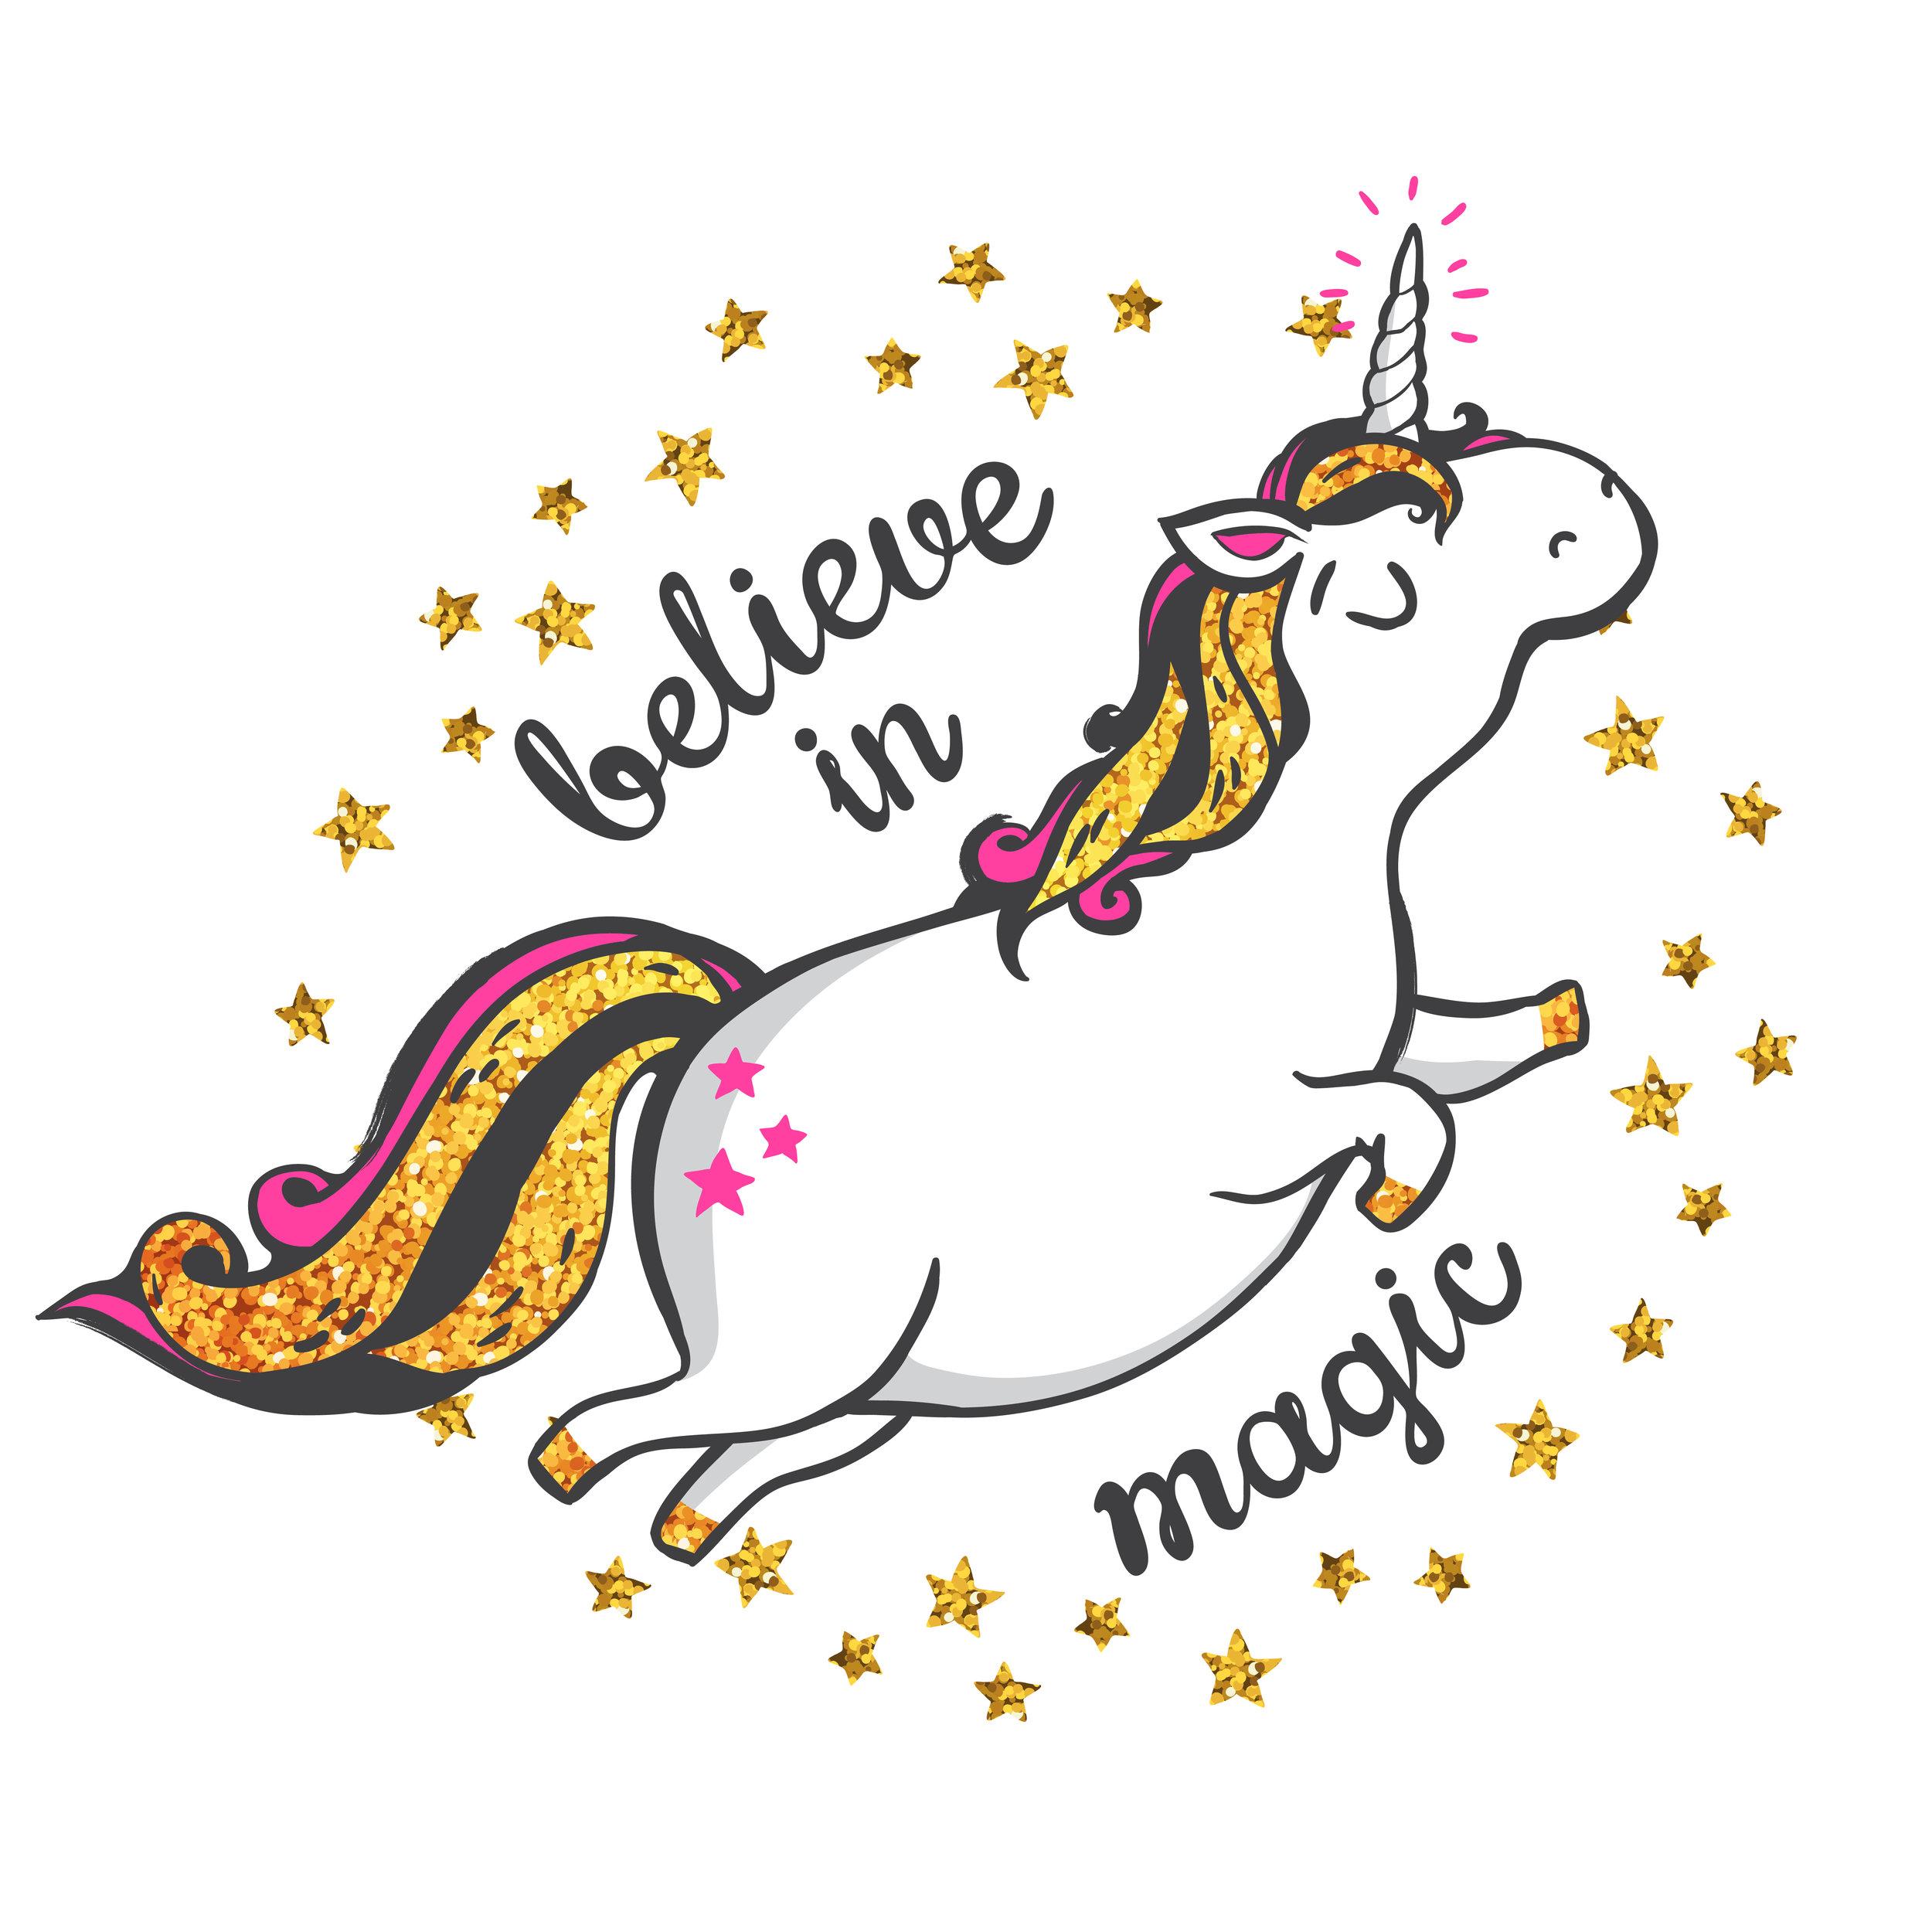 Believe-in-unicorns.jpg